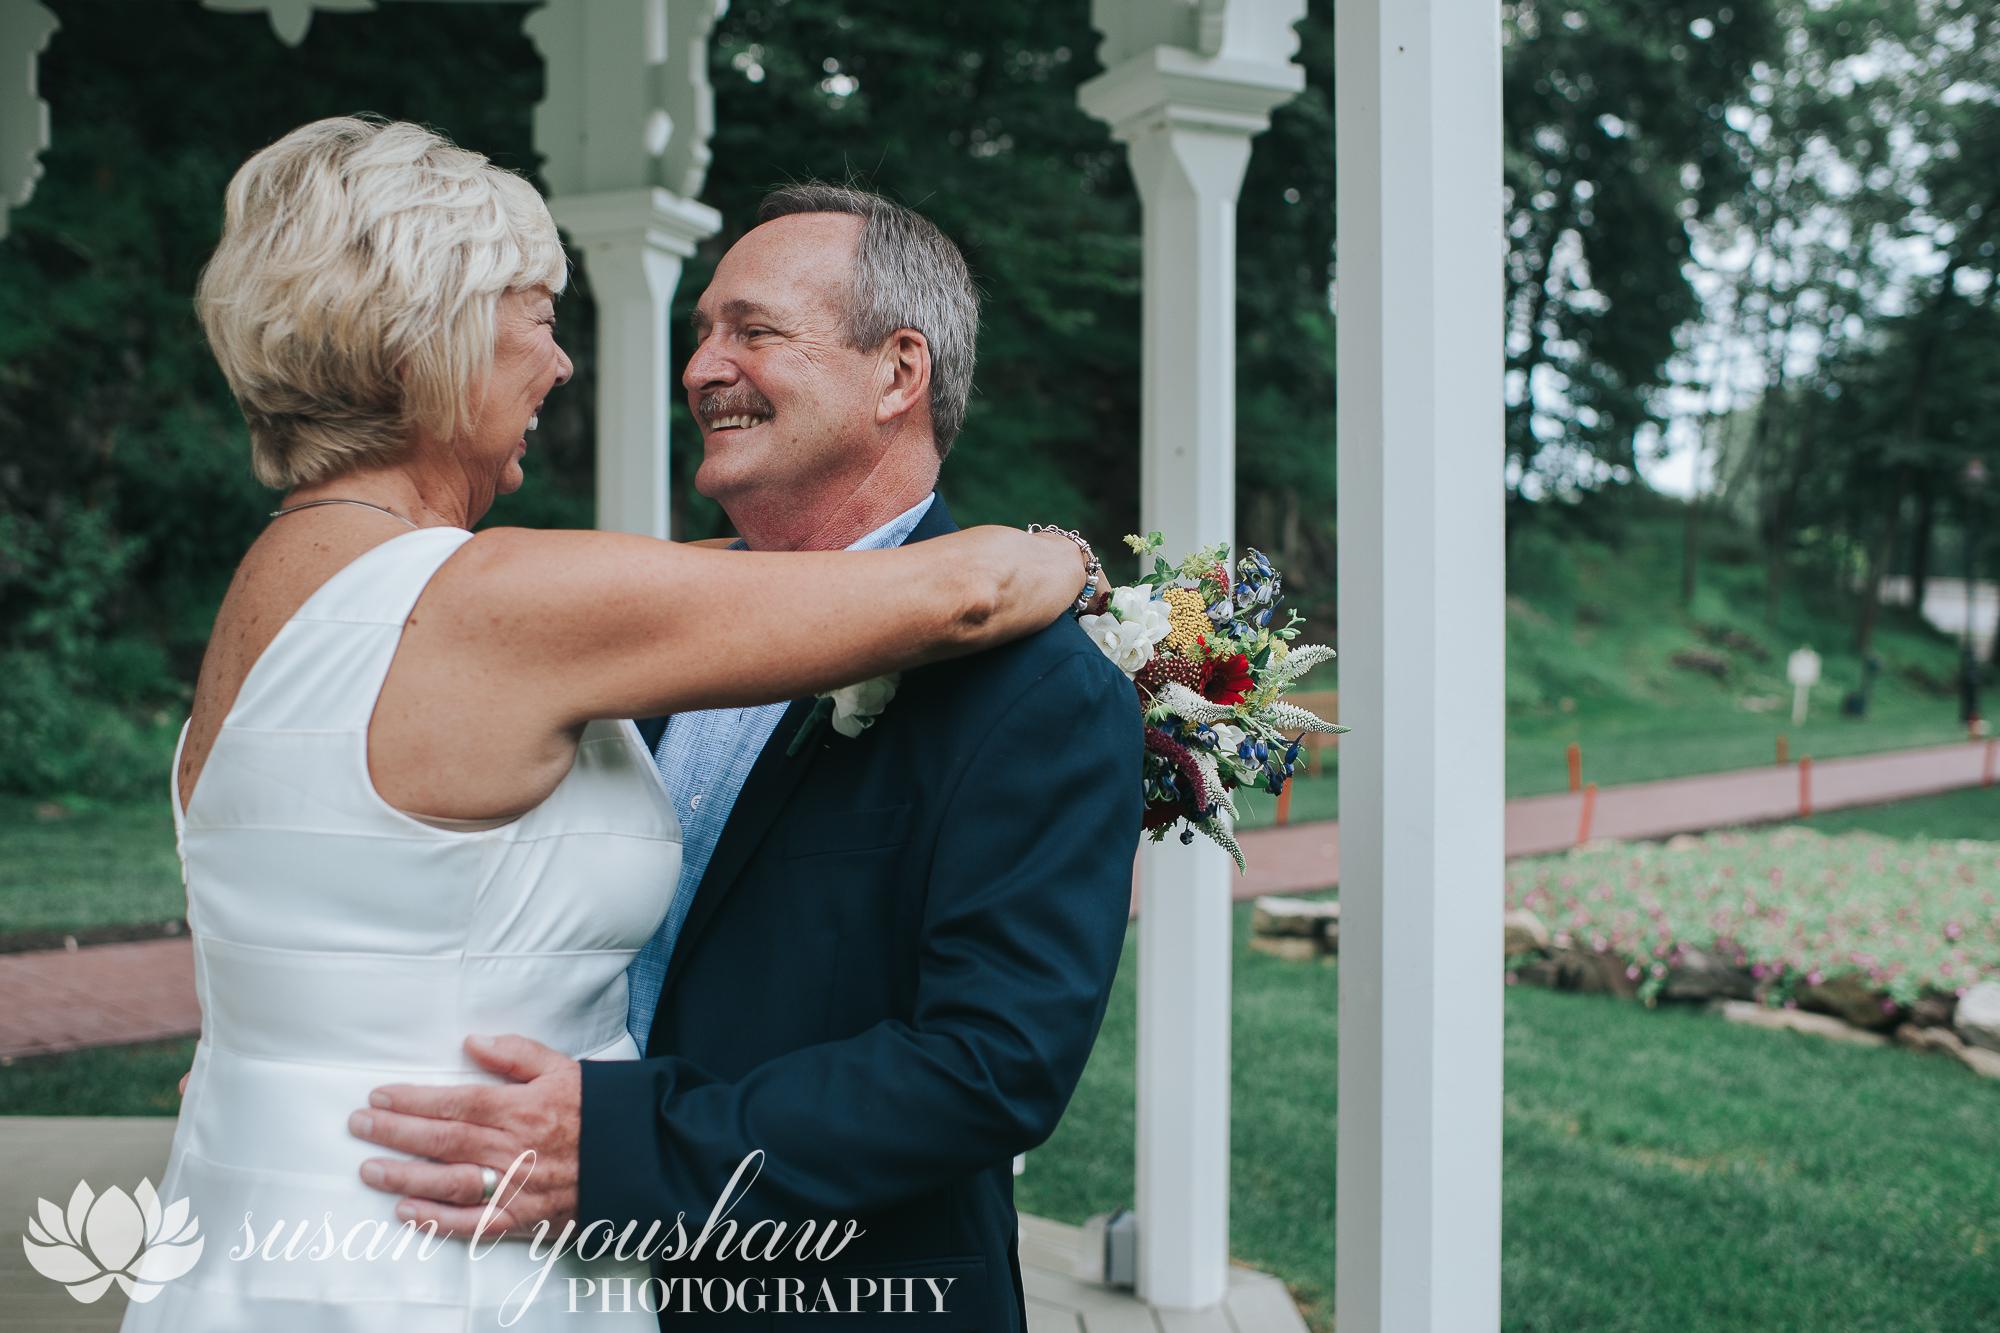 BLOG Carolyn Adams and Jim McCune 07-04-2018 SLY Photography-118.jpg